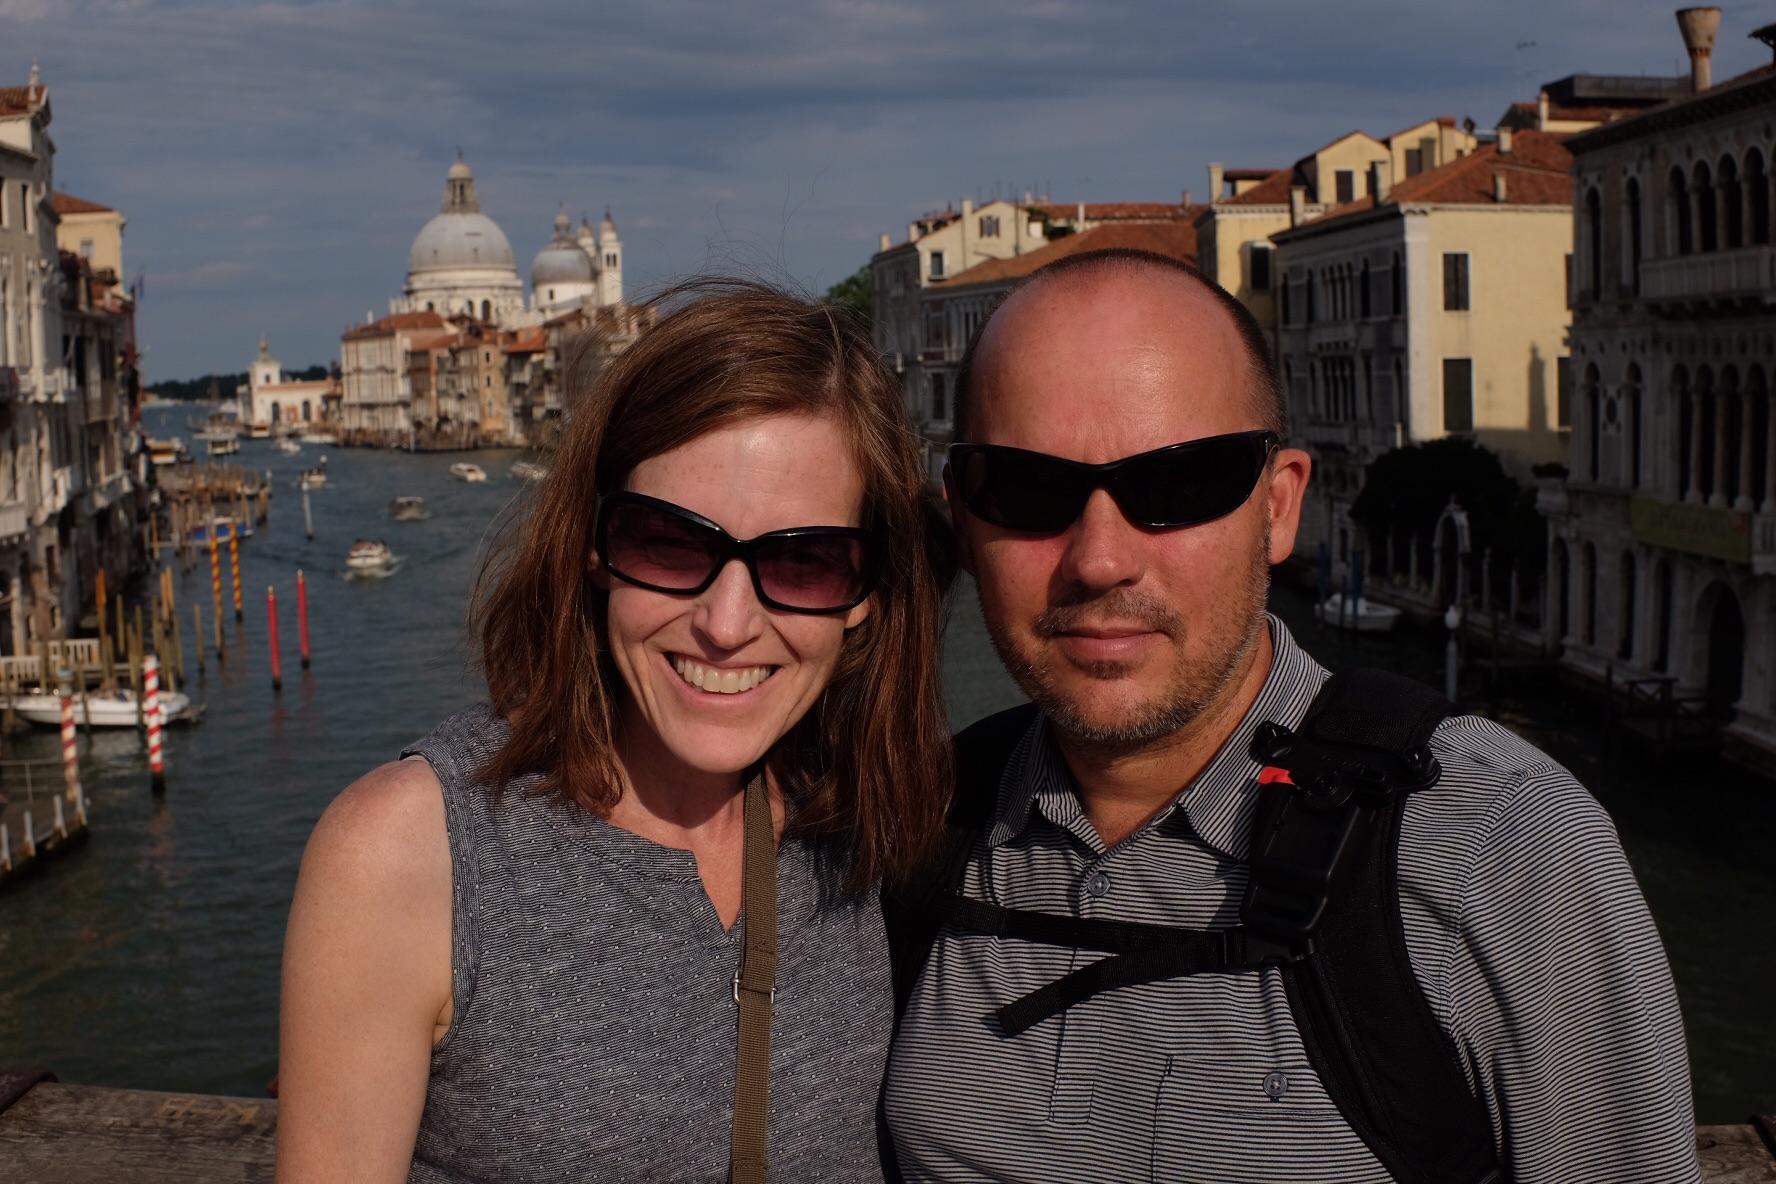 Tin and me on the Accademie Bridge